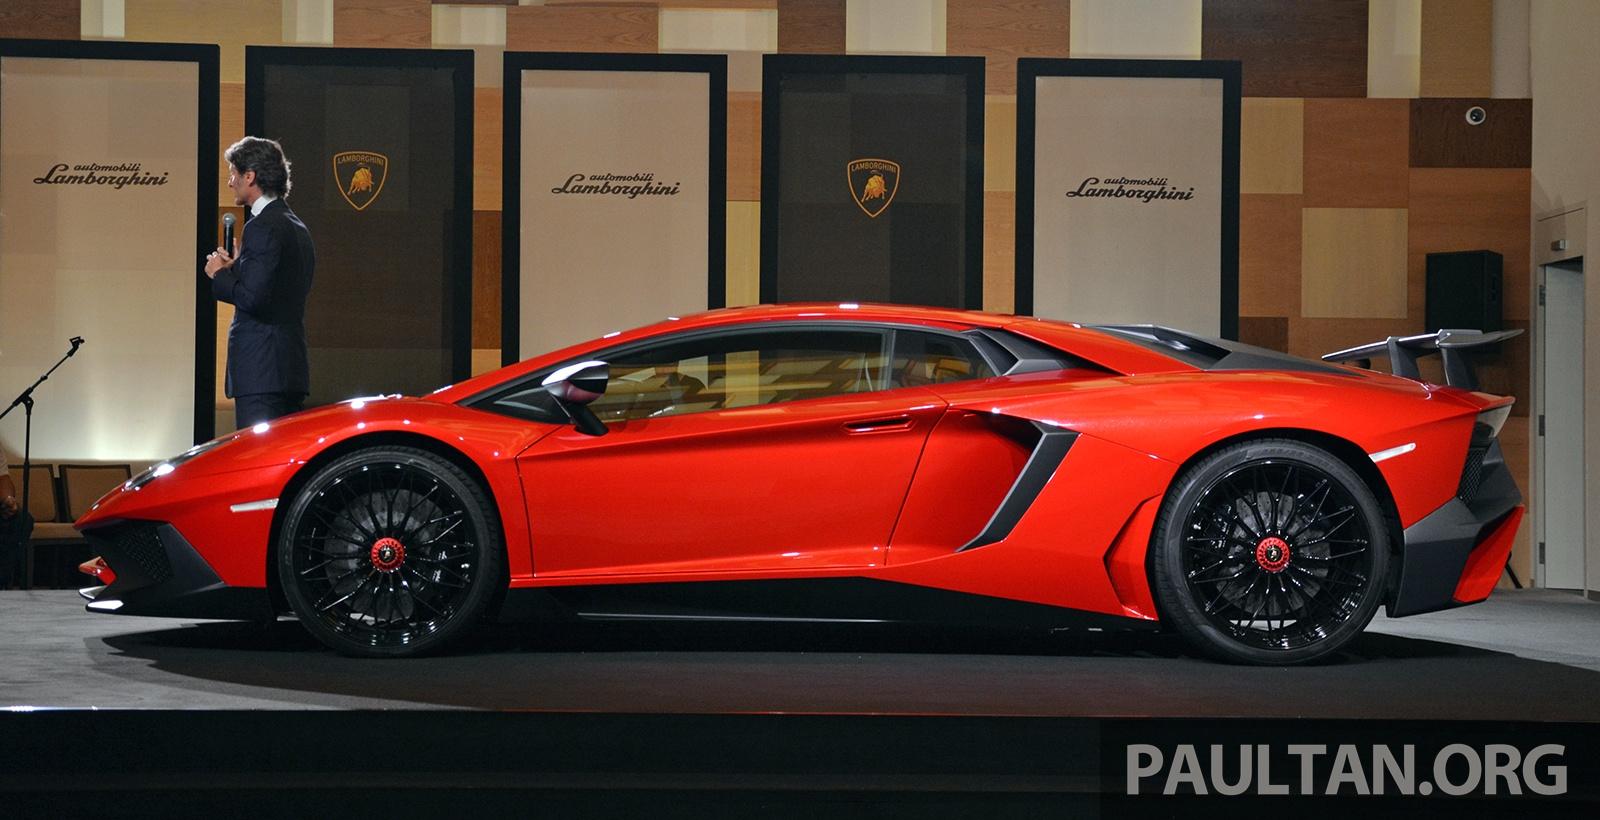 2017 Lambo Price >> Lamborghini Aventador LP750-4 Superveloce makes ASEAN ...